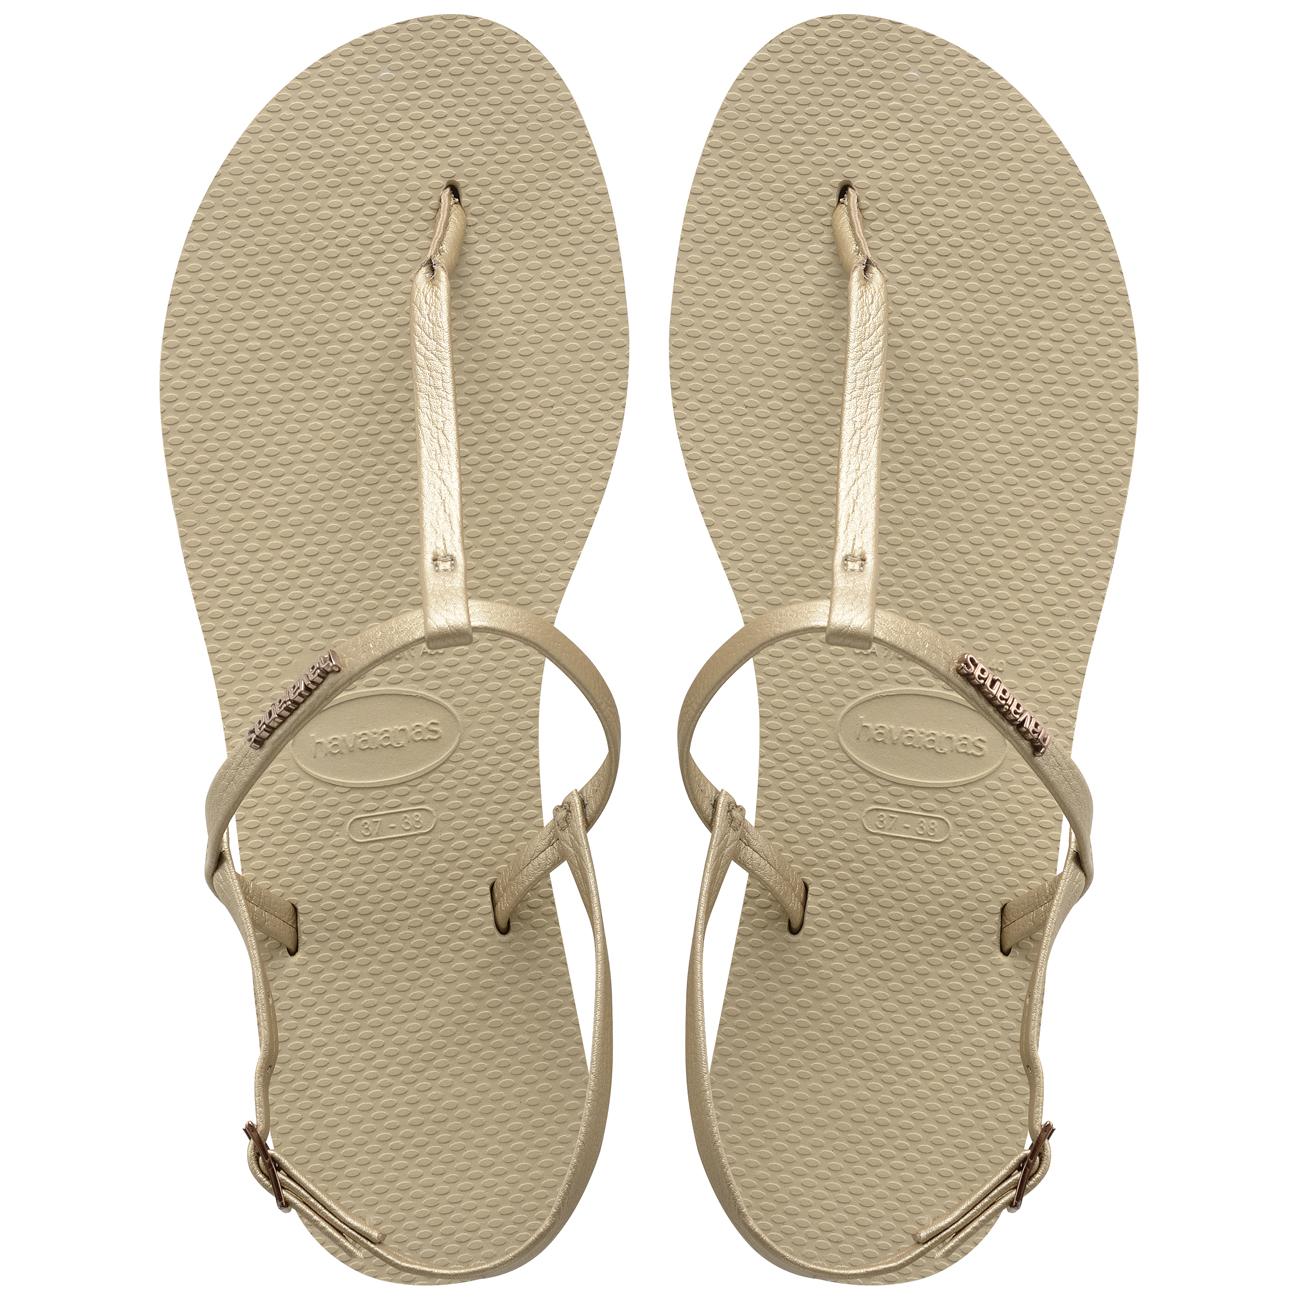 b20089d30817d Havaianas You Riviera Grape Vegan Strap Rubber Women Sandals Gold UK ...